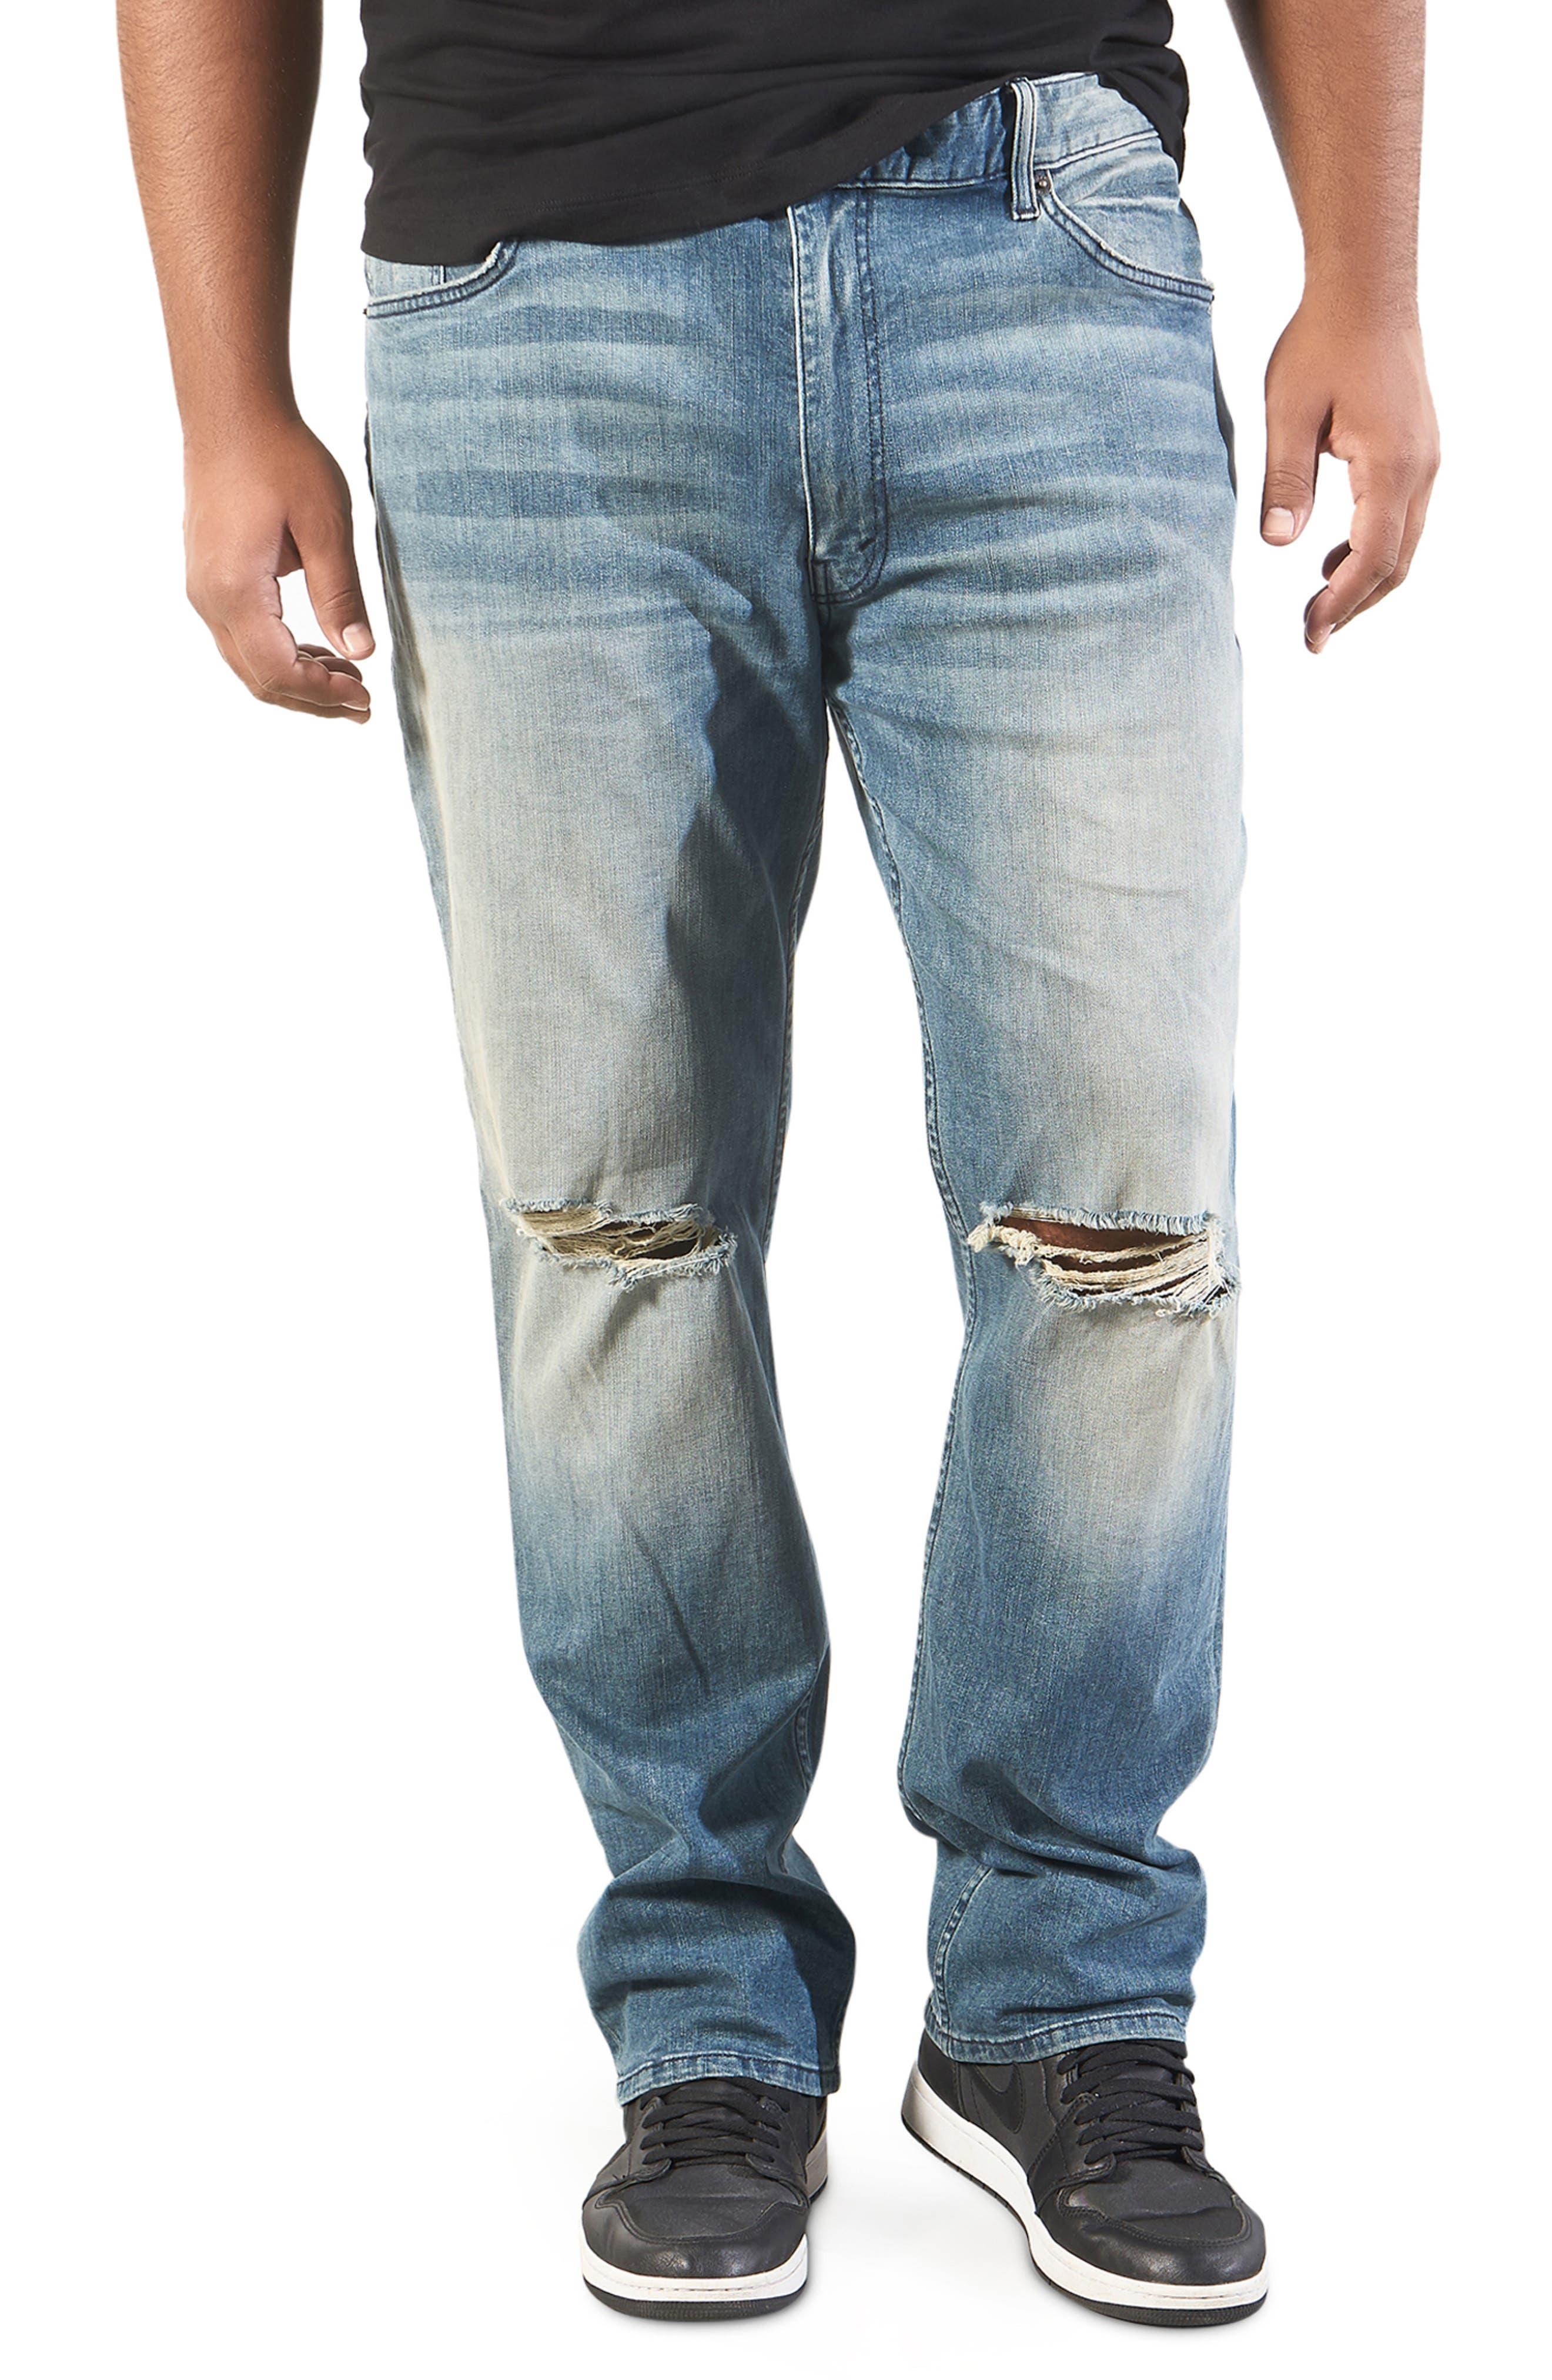 UUYUK-Men Frayed Raw Hem Straight Destroyed Ripped Distressed Jeans Short